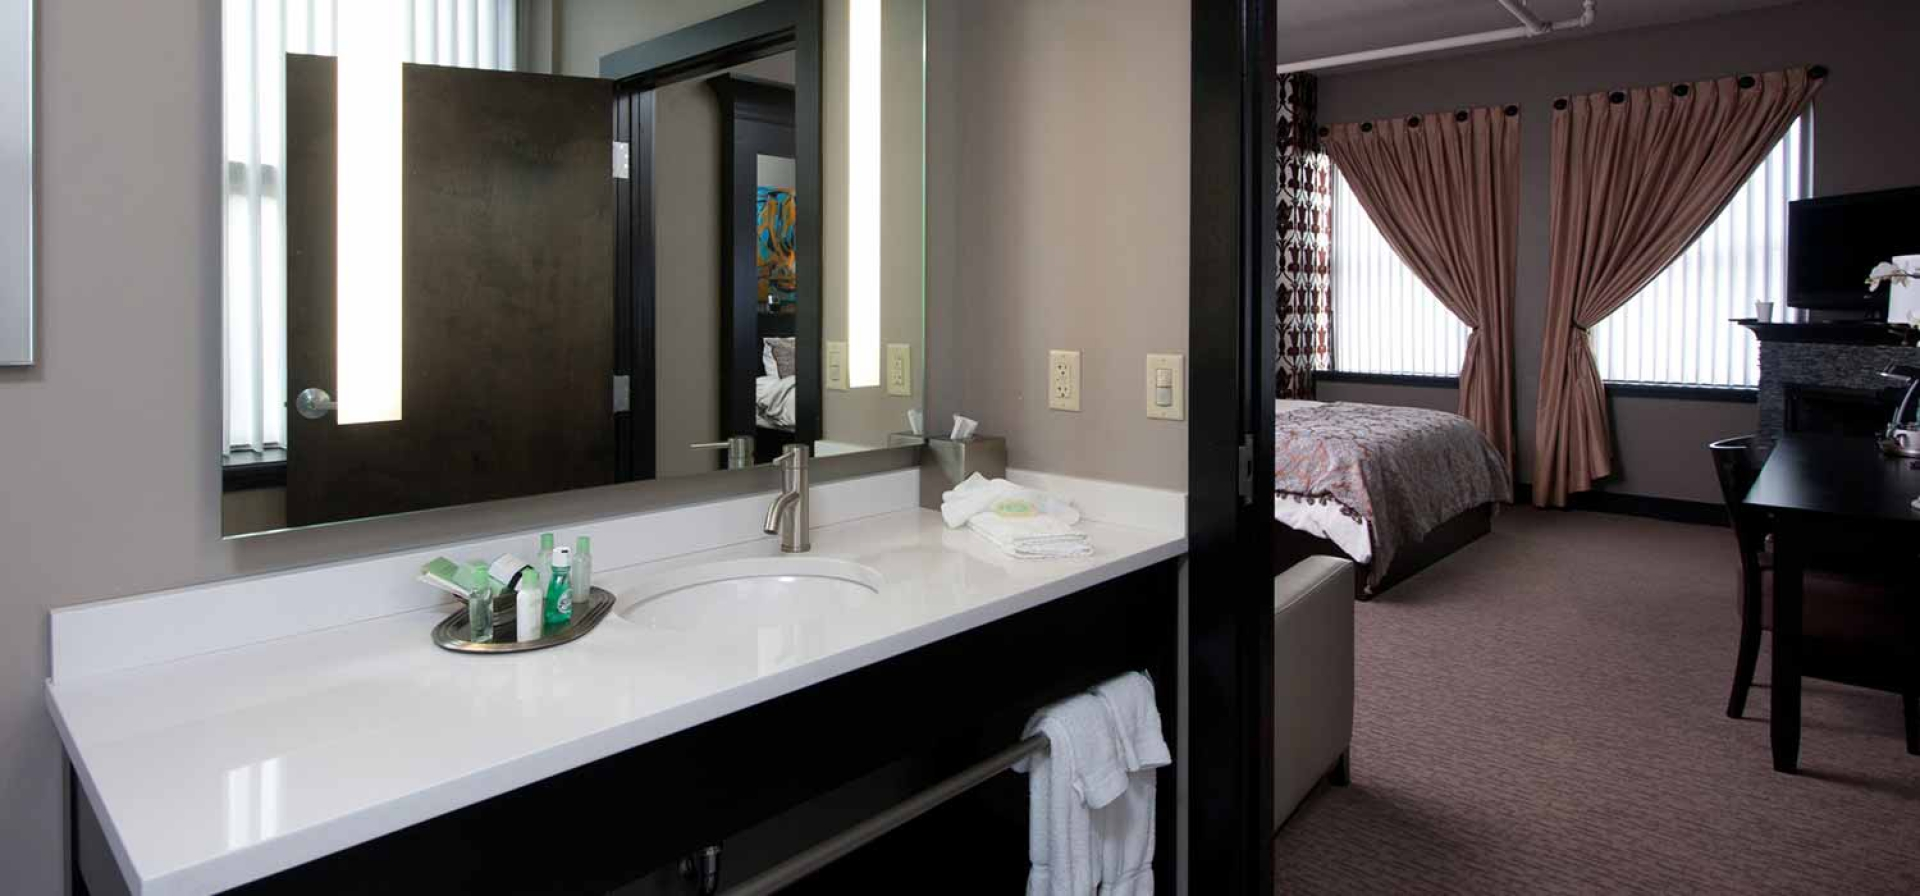 Bathroom Remodeling Niagara Falls Ny the giacomo hotel | luxury boutique hotel niagara falls, ny |